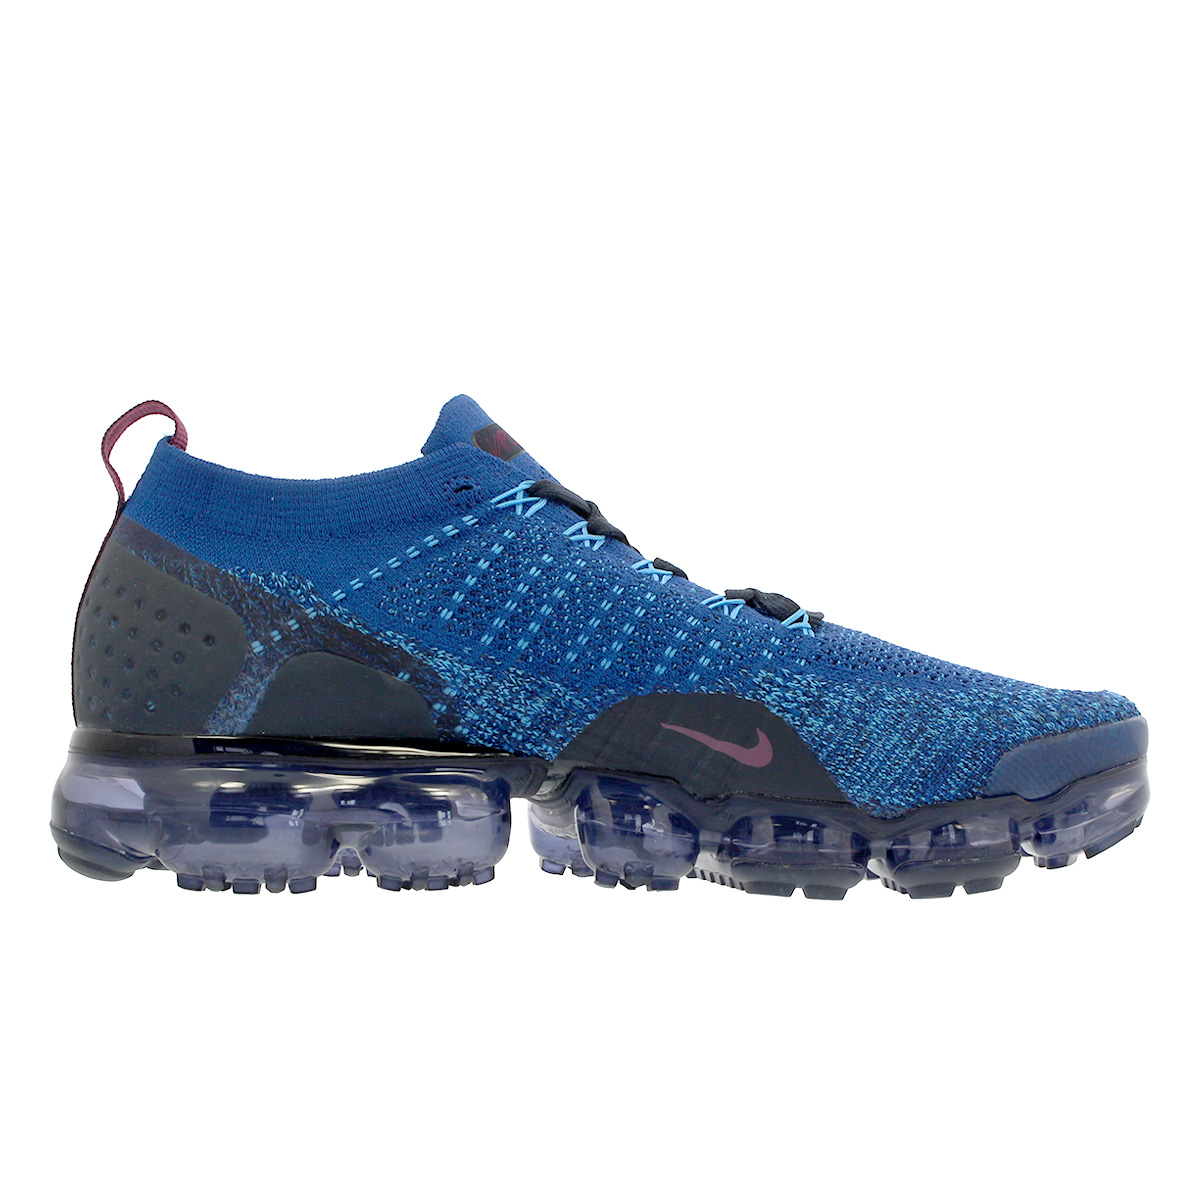 29342e397dda NIKE AIR VAPORMAX FLYKNIT 2 Nike vapor max fried food knit 2 GYM  BLUE BORDEAUX COLLEGE NAVY BLUE GLOW 942